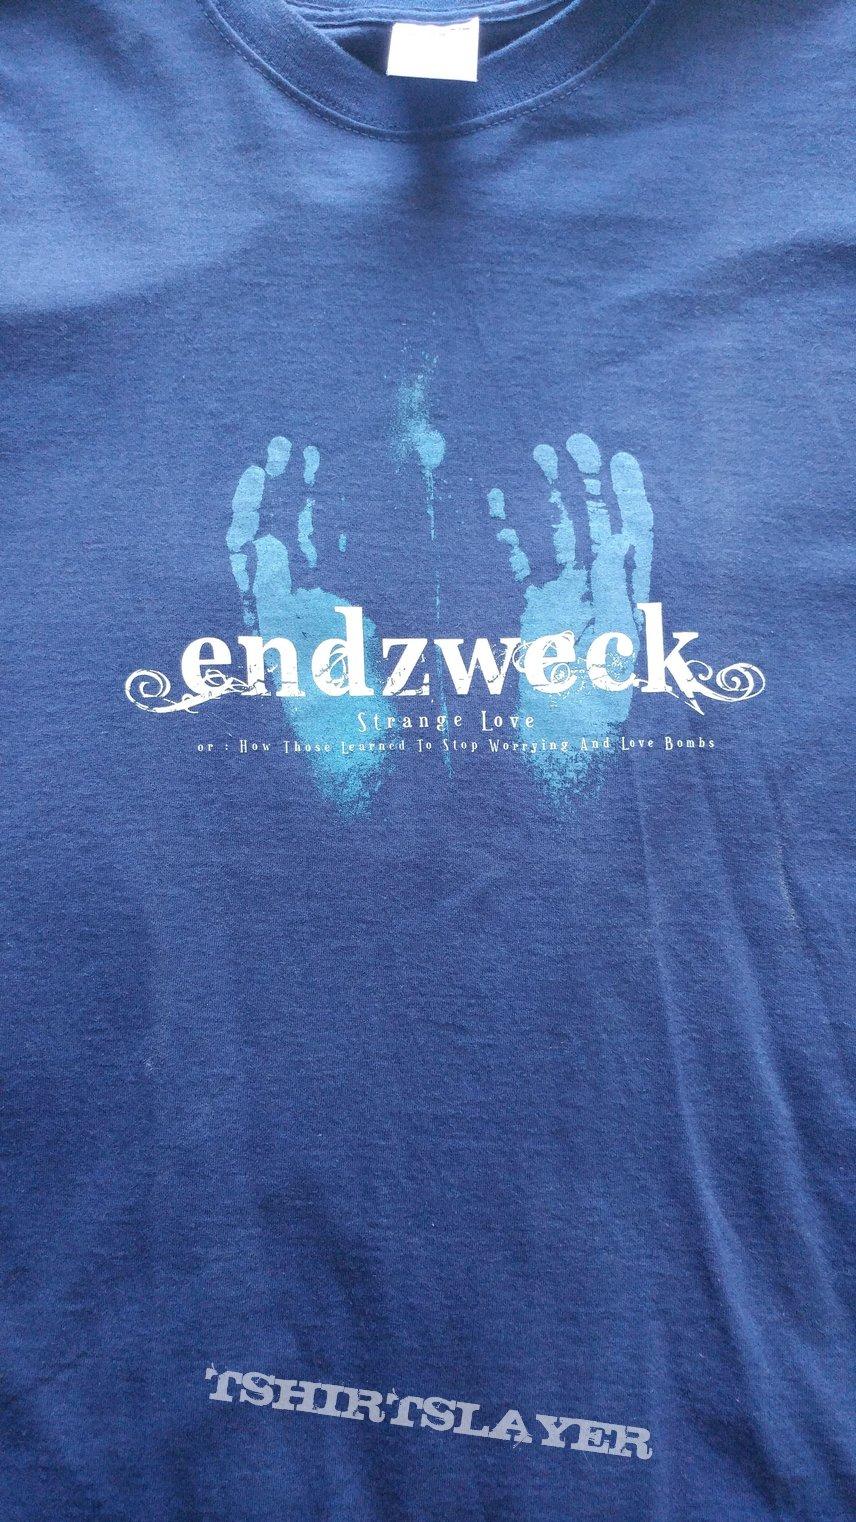 Endzweck Strange Love Good Life shirt